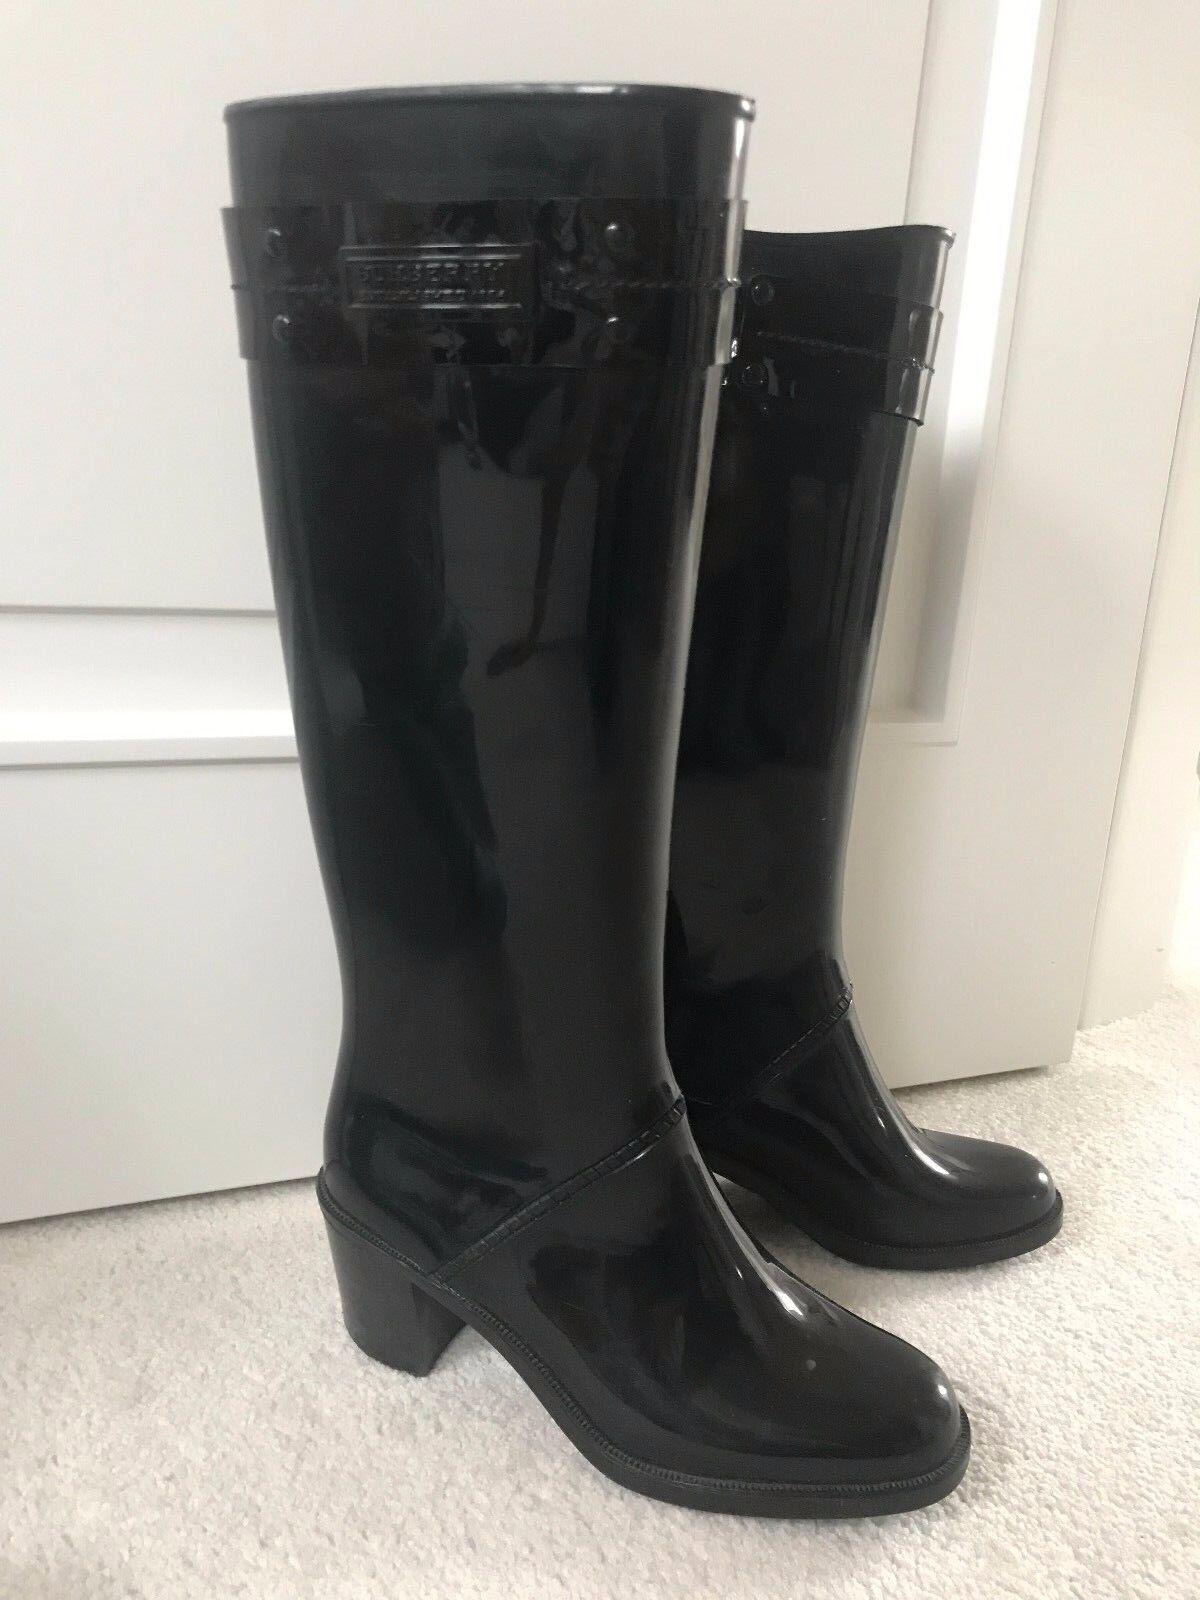 Burberry patent black rubber tall heel Rainboots Boots 37, 6 1 2